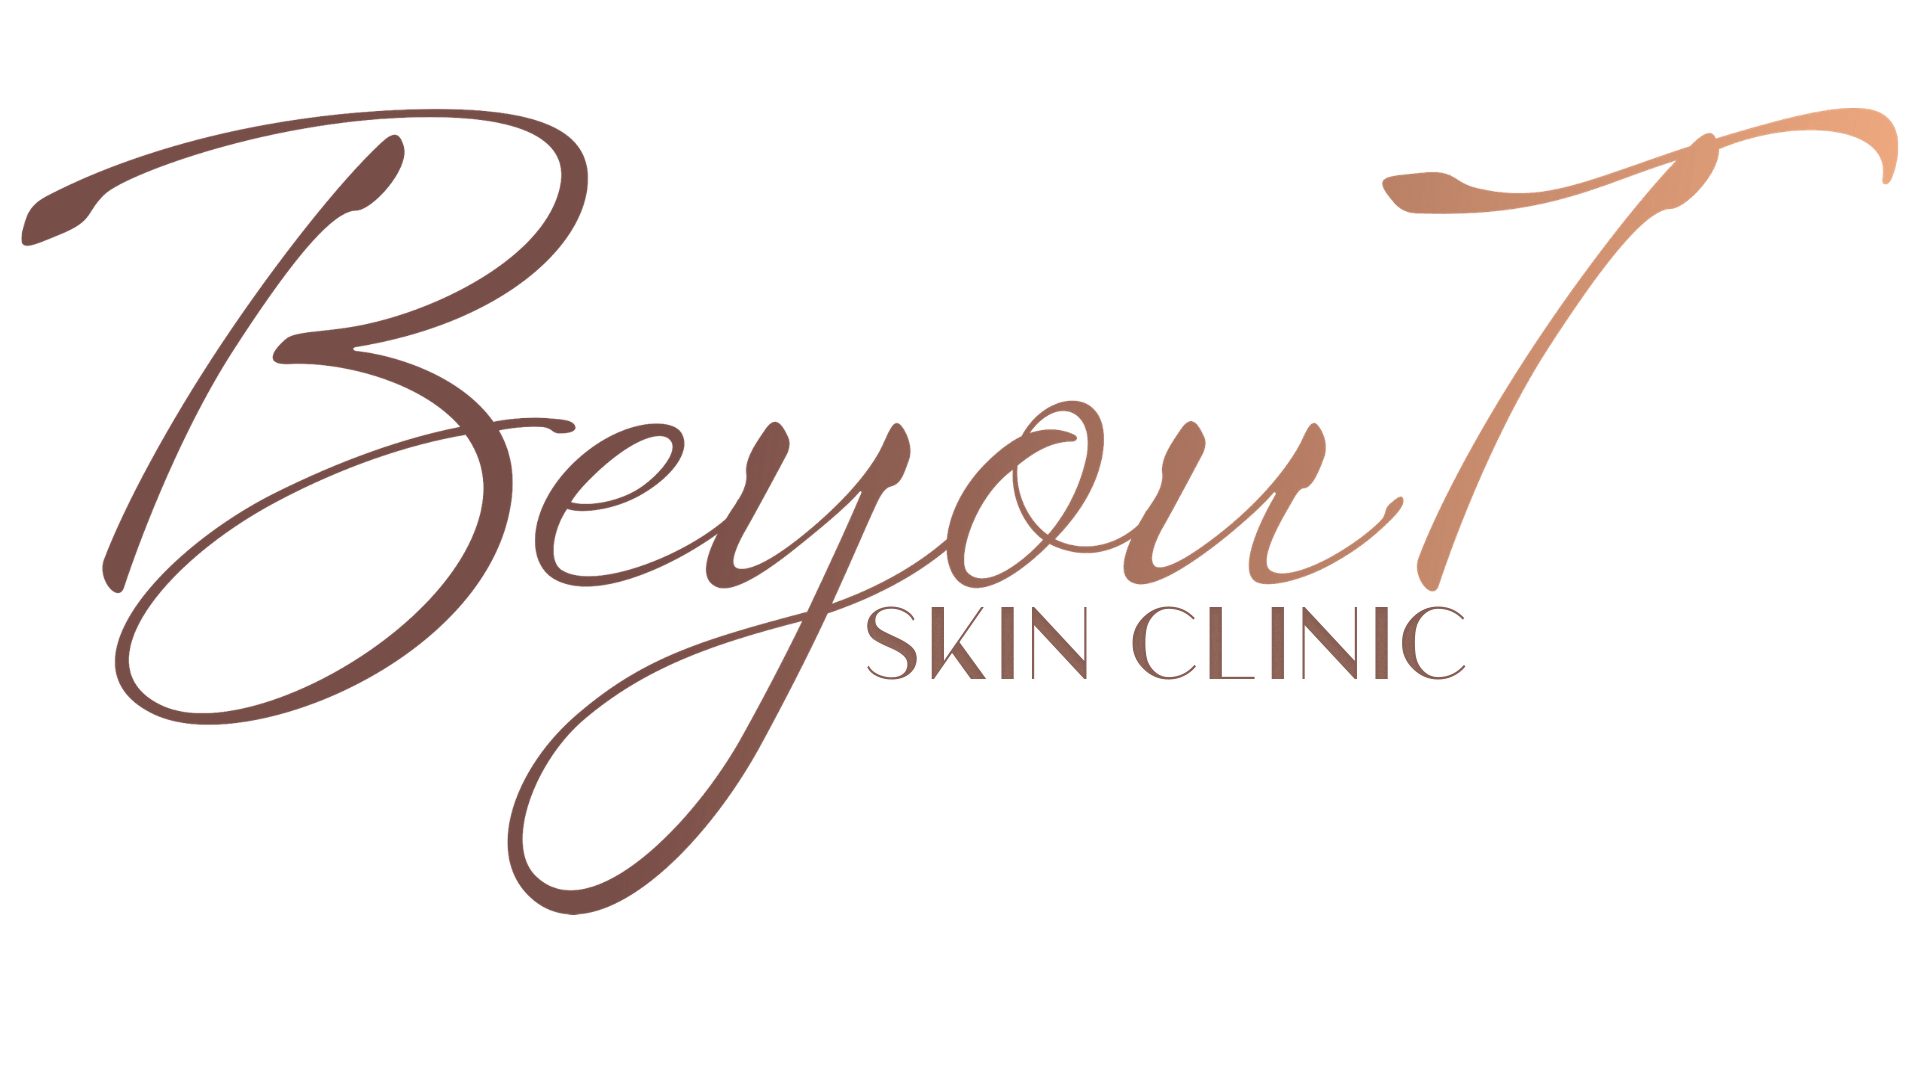 BeyouT Skin Clinic